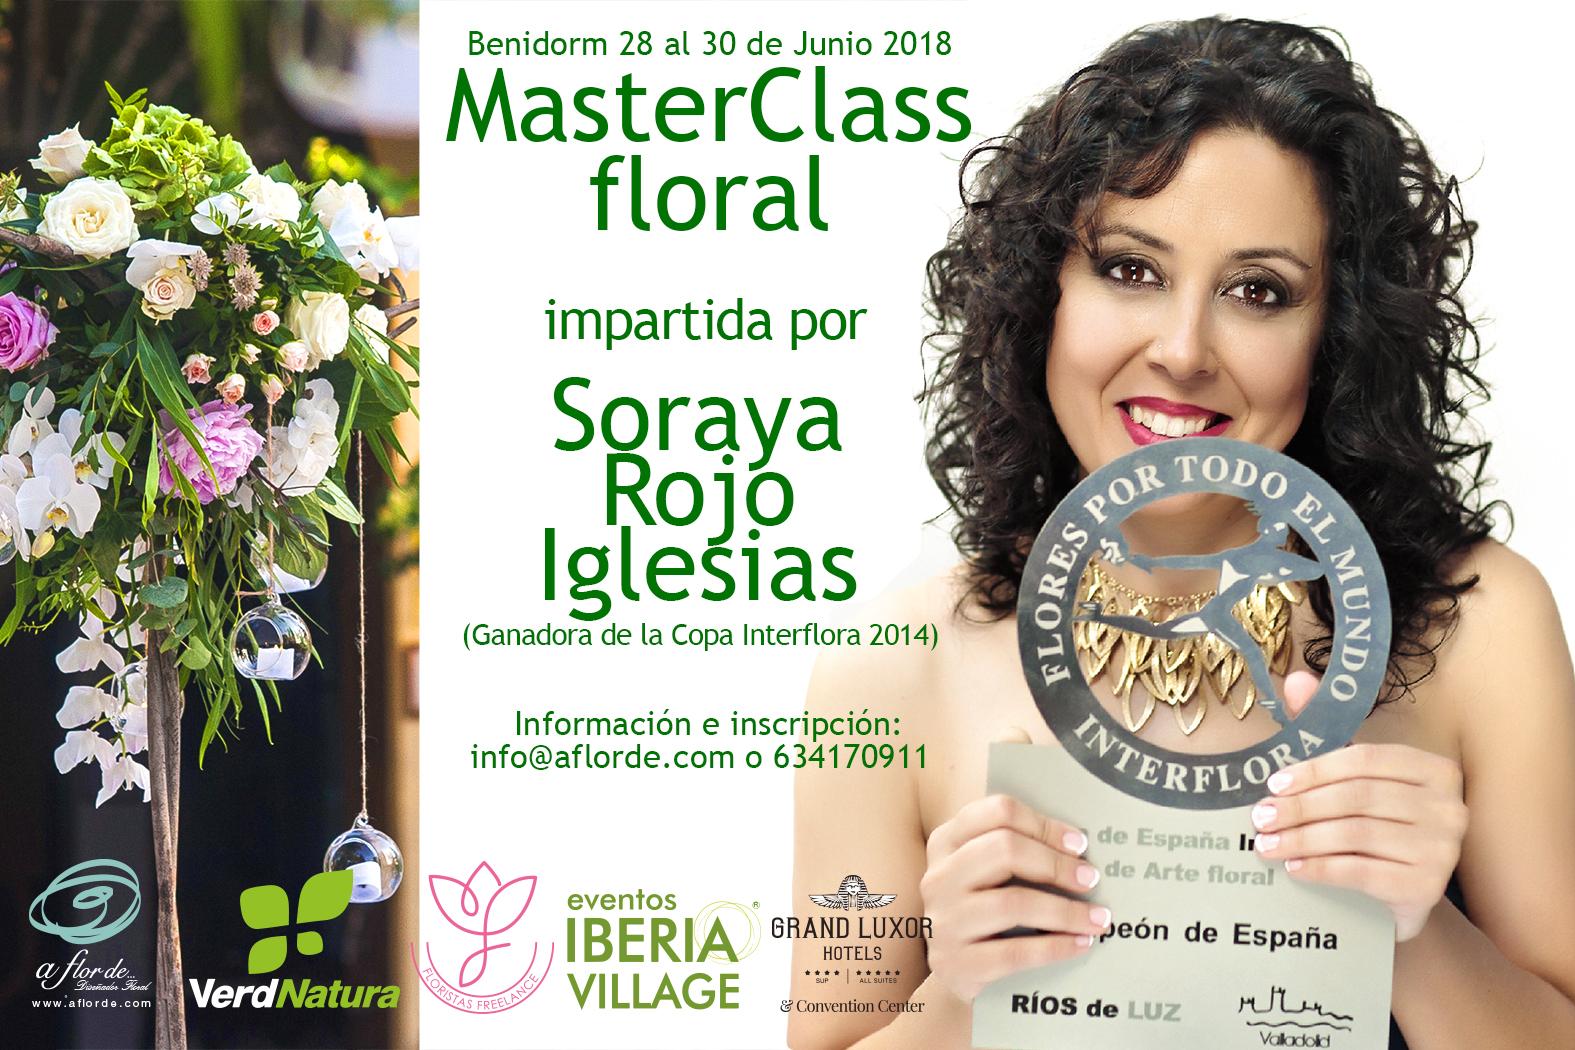 MasterClass Floral Soraya Rojo Iglesias